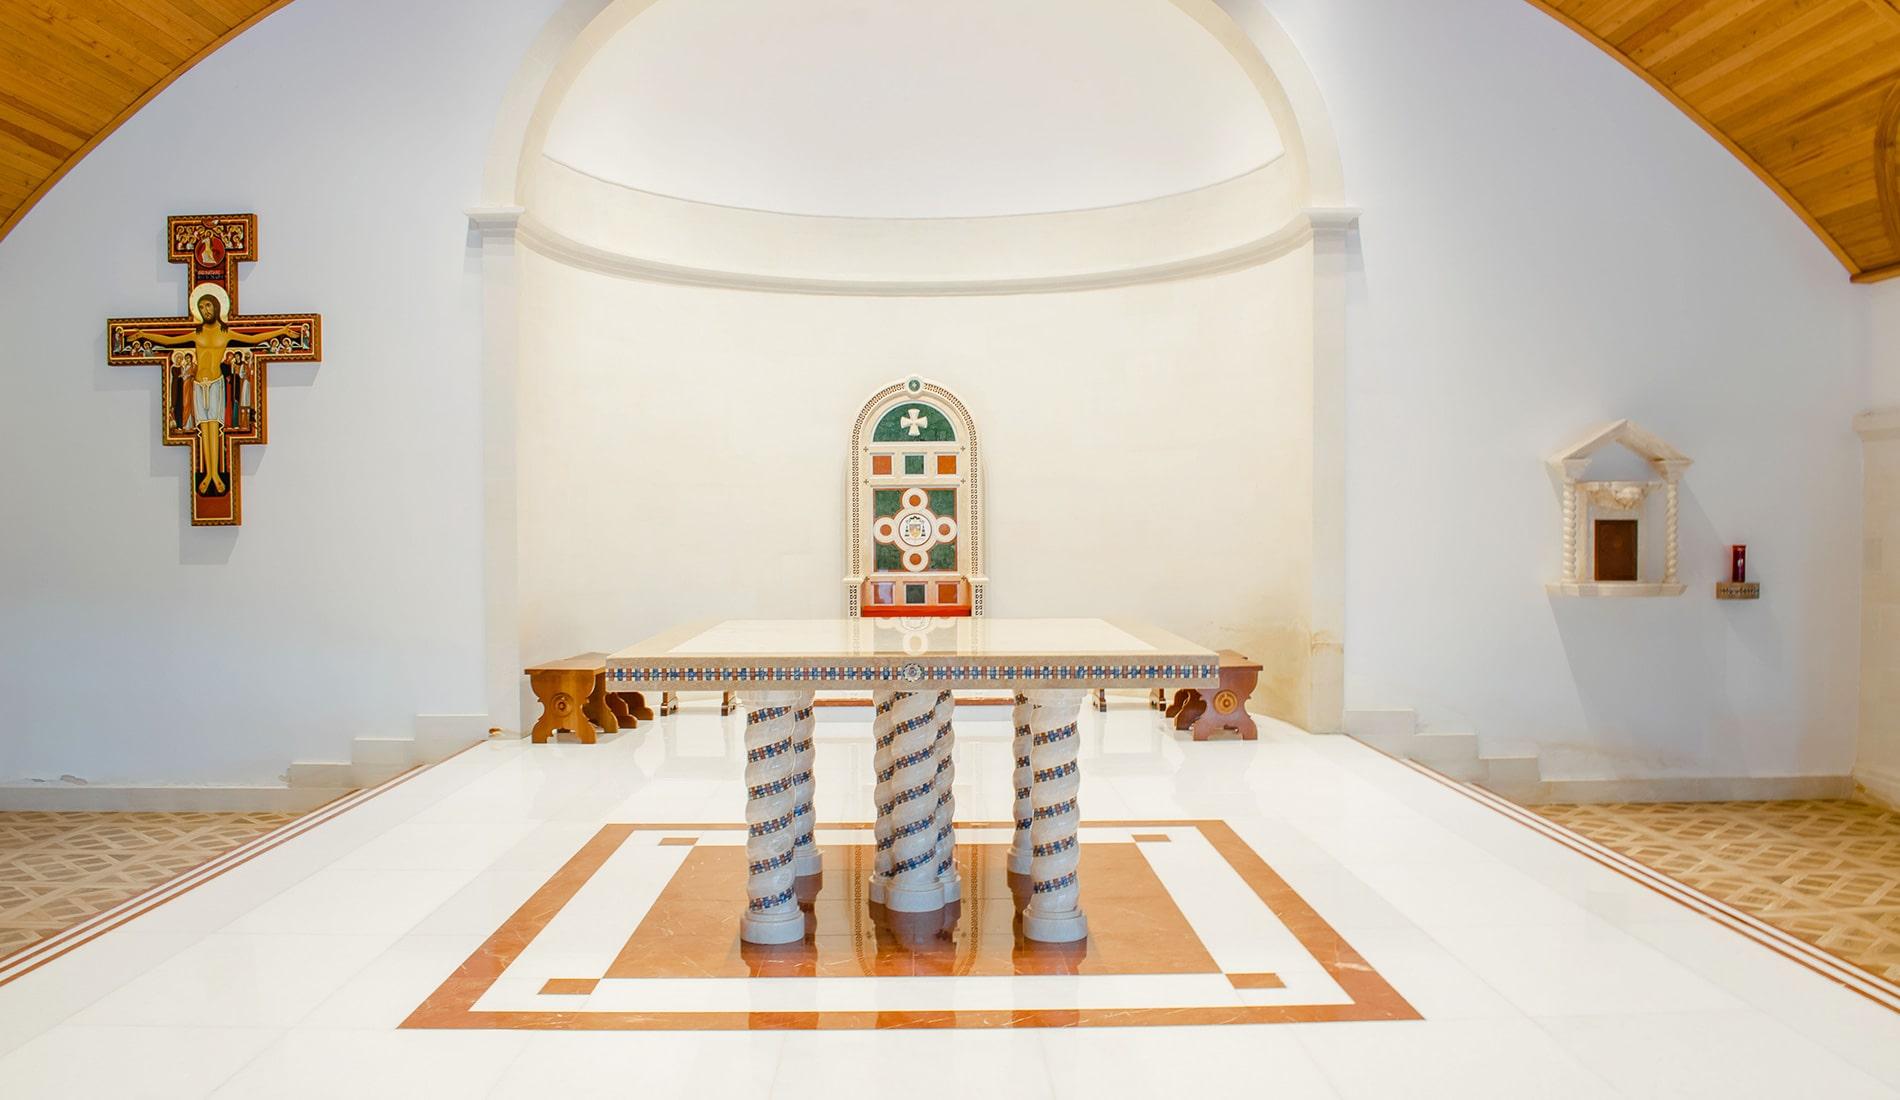 marmi-strada-villa-castelli-brindisi-marmi-graniti-mosaici-arte-sacra-architettura-chiese-7